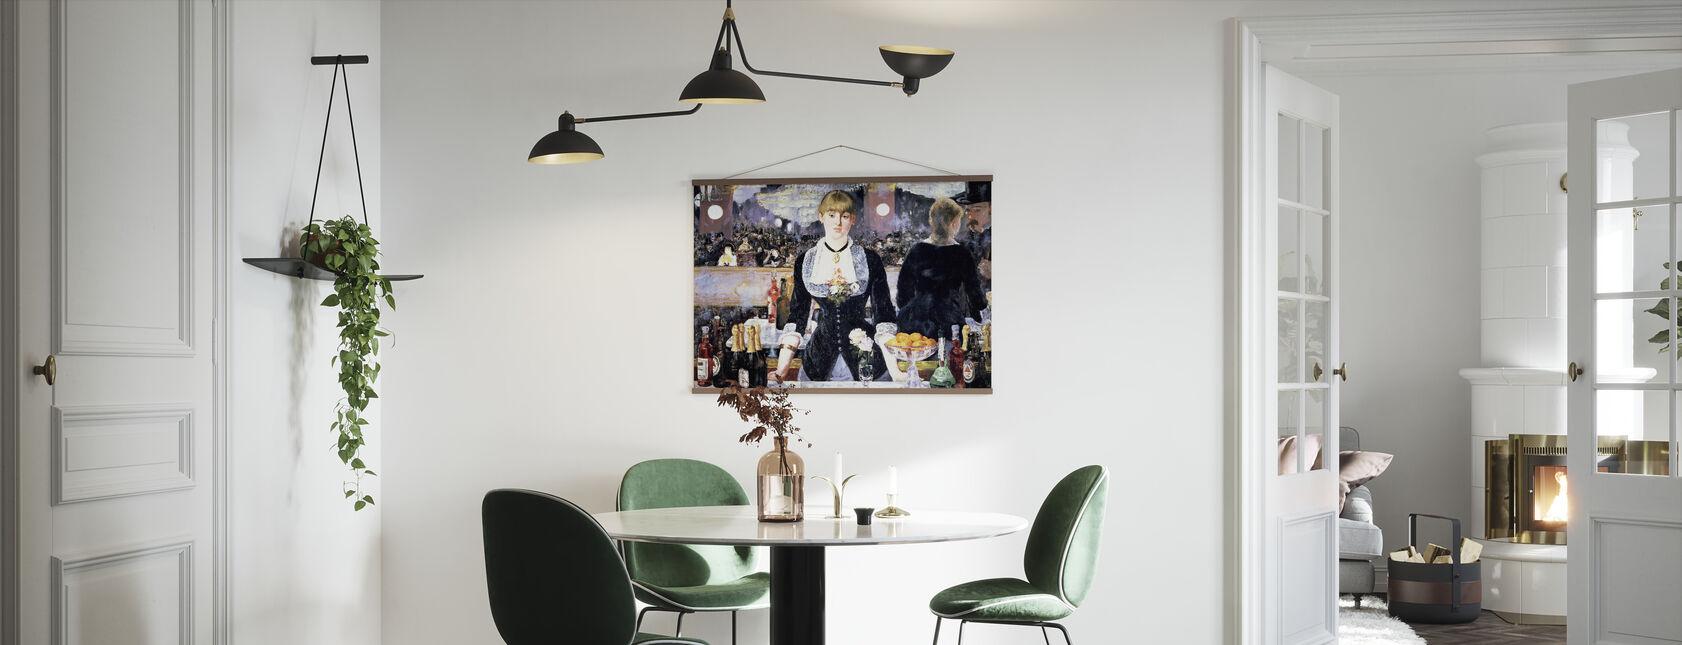 Bar på Folies-Bergere, Edouard Manet - Plakat - Kjøkken